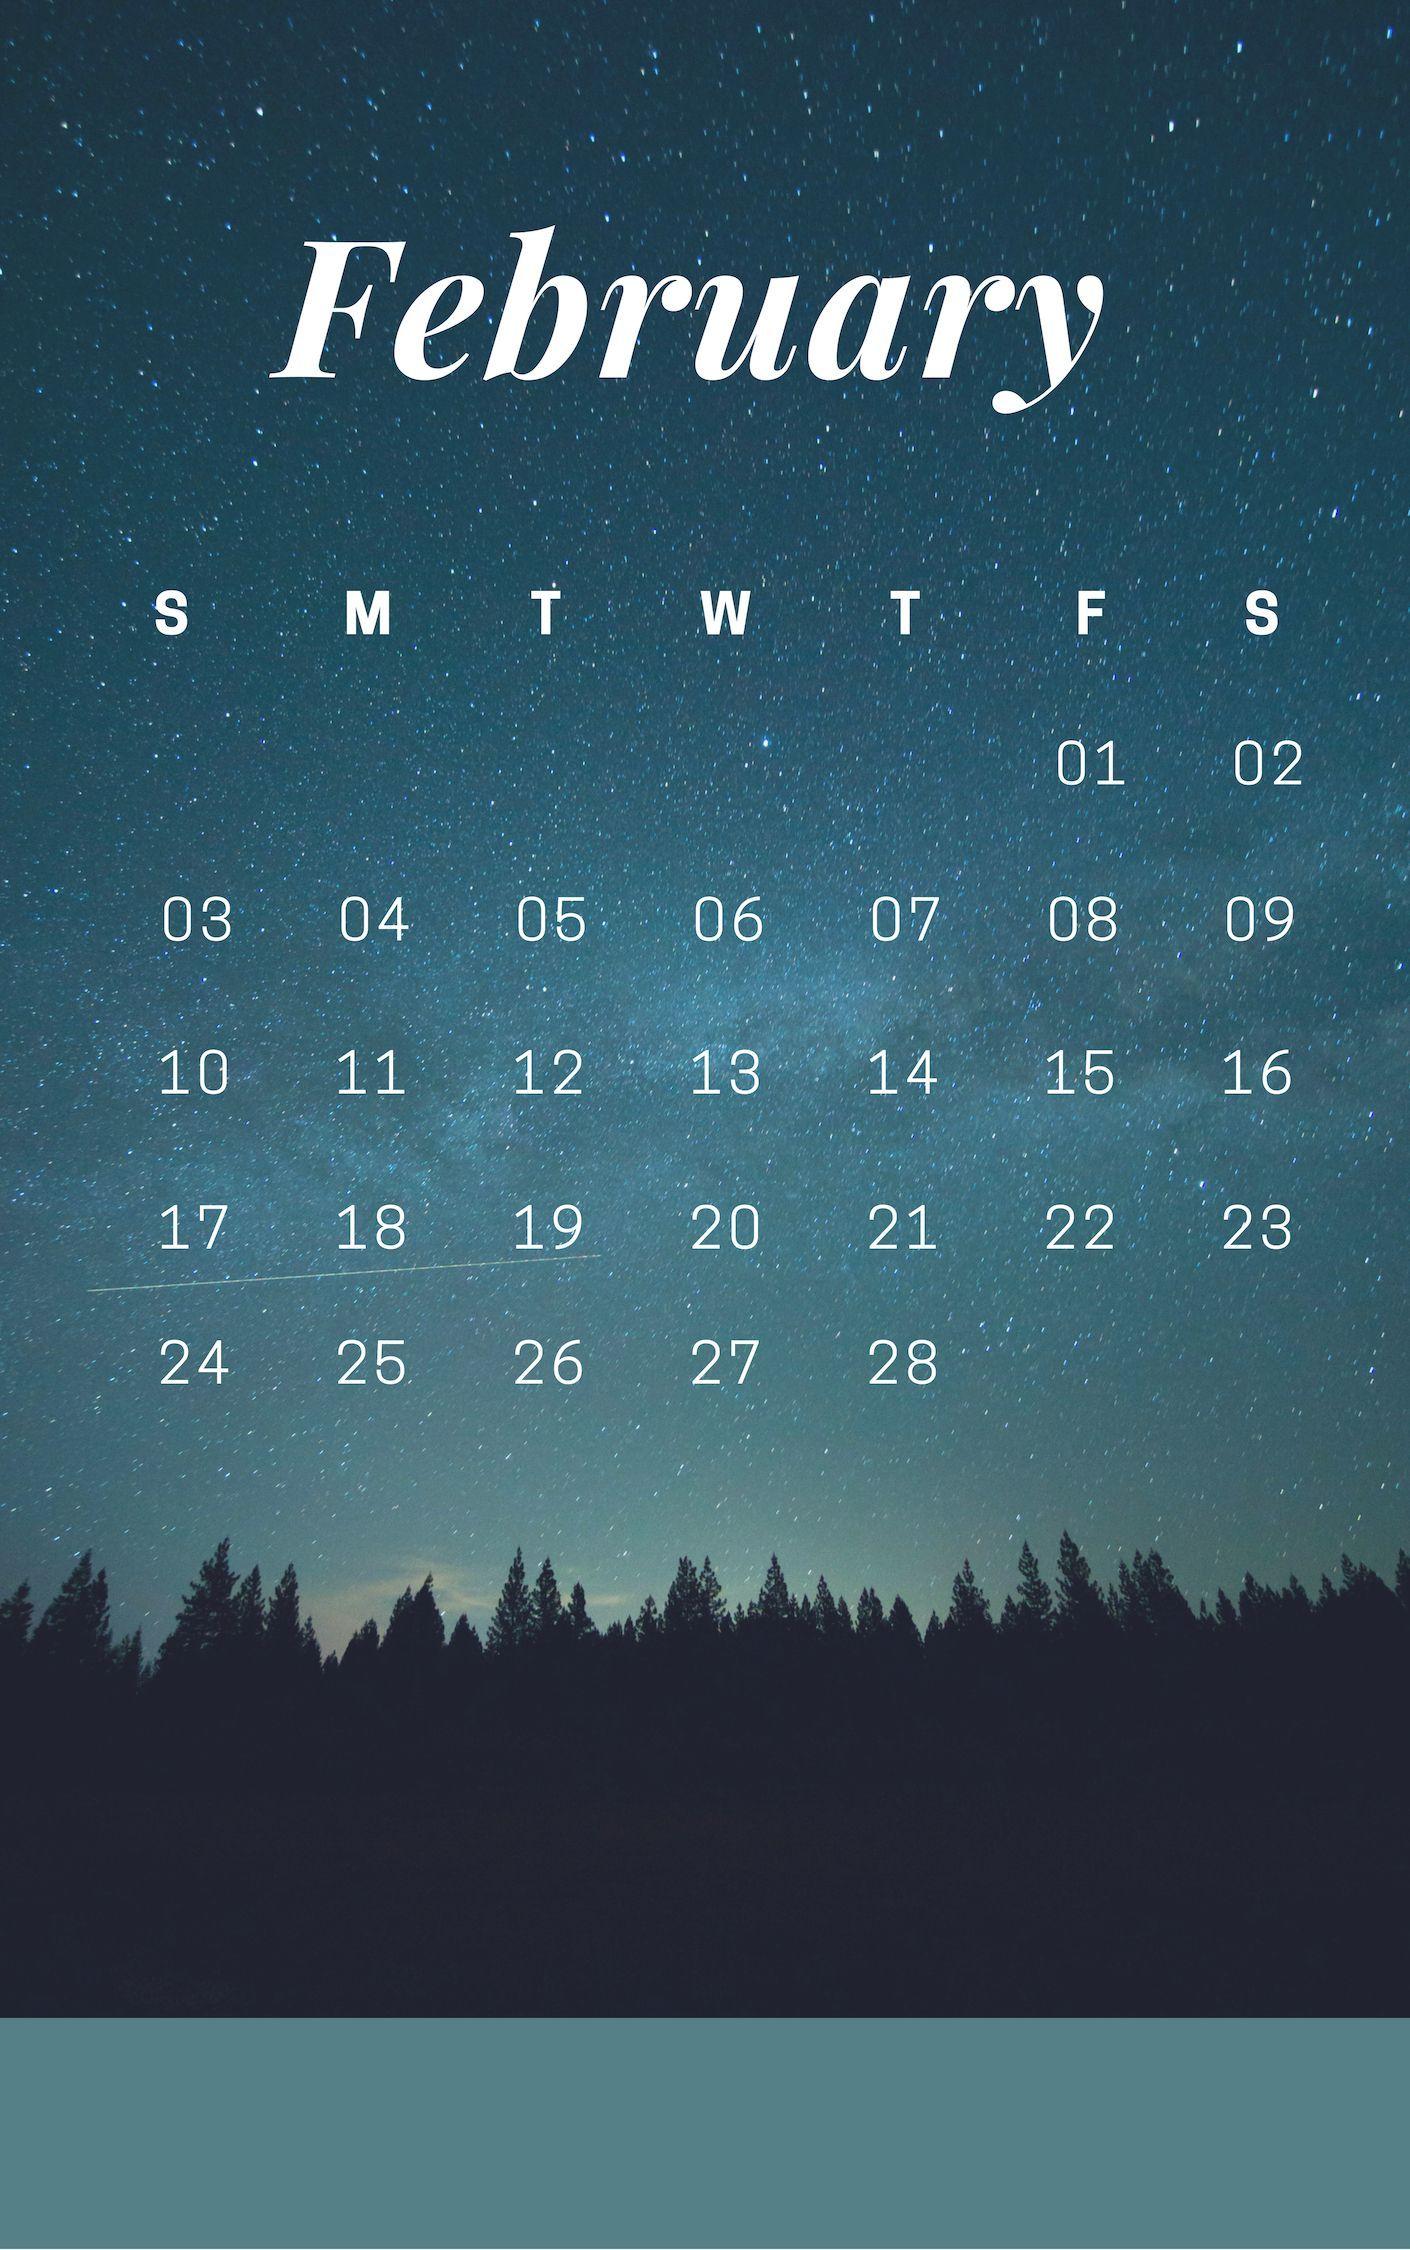 february 2019 iphone calendar 2019 calendars in 2019 calendar rh pinterest com